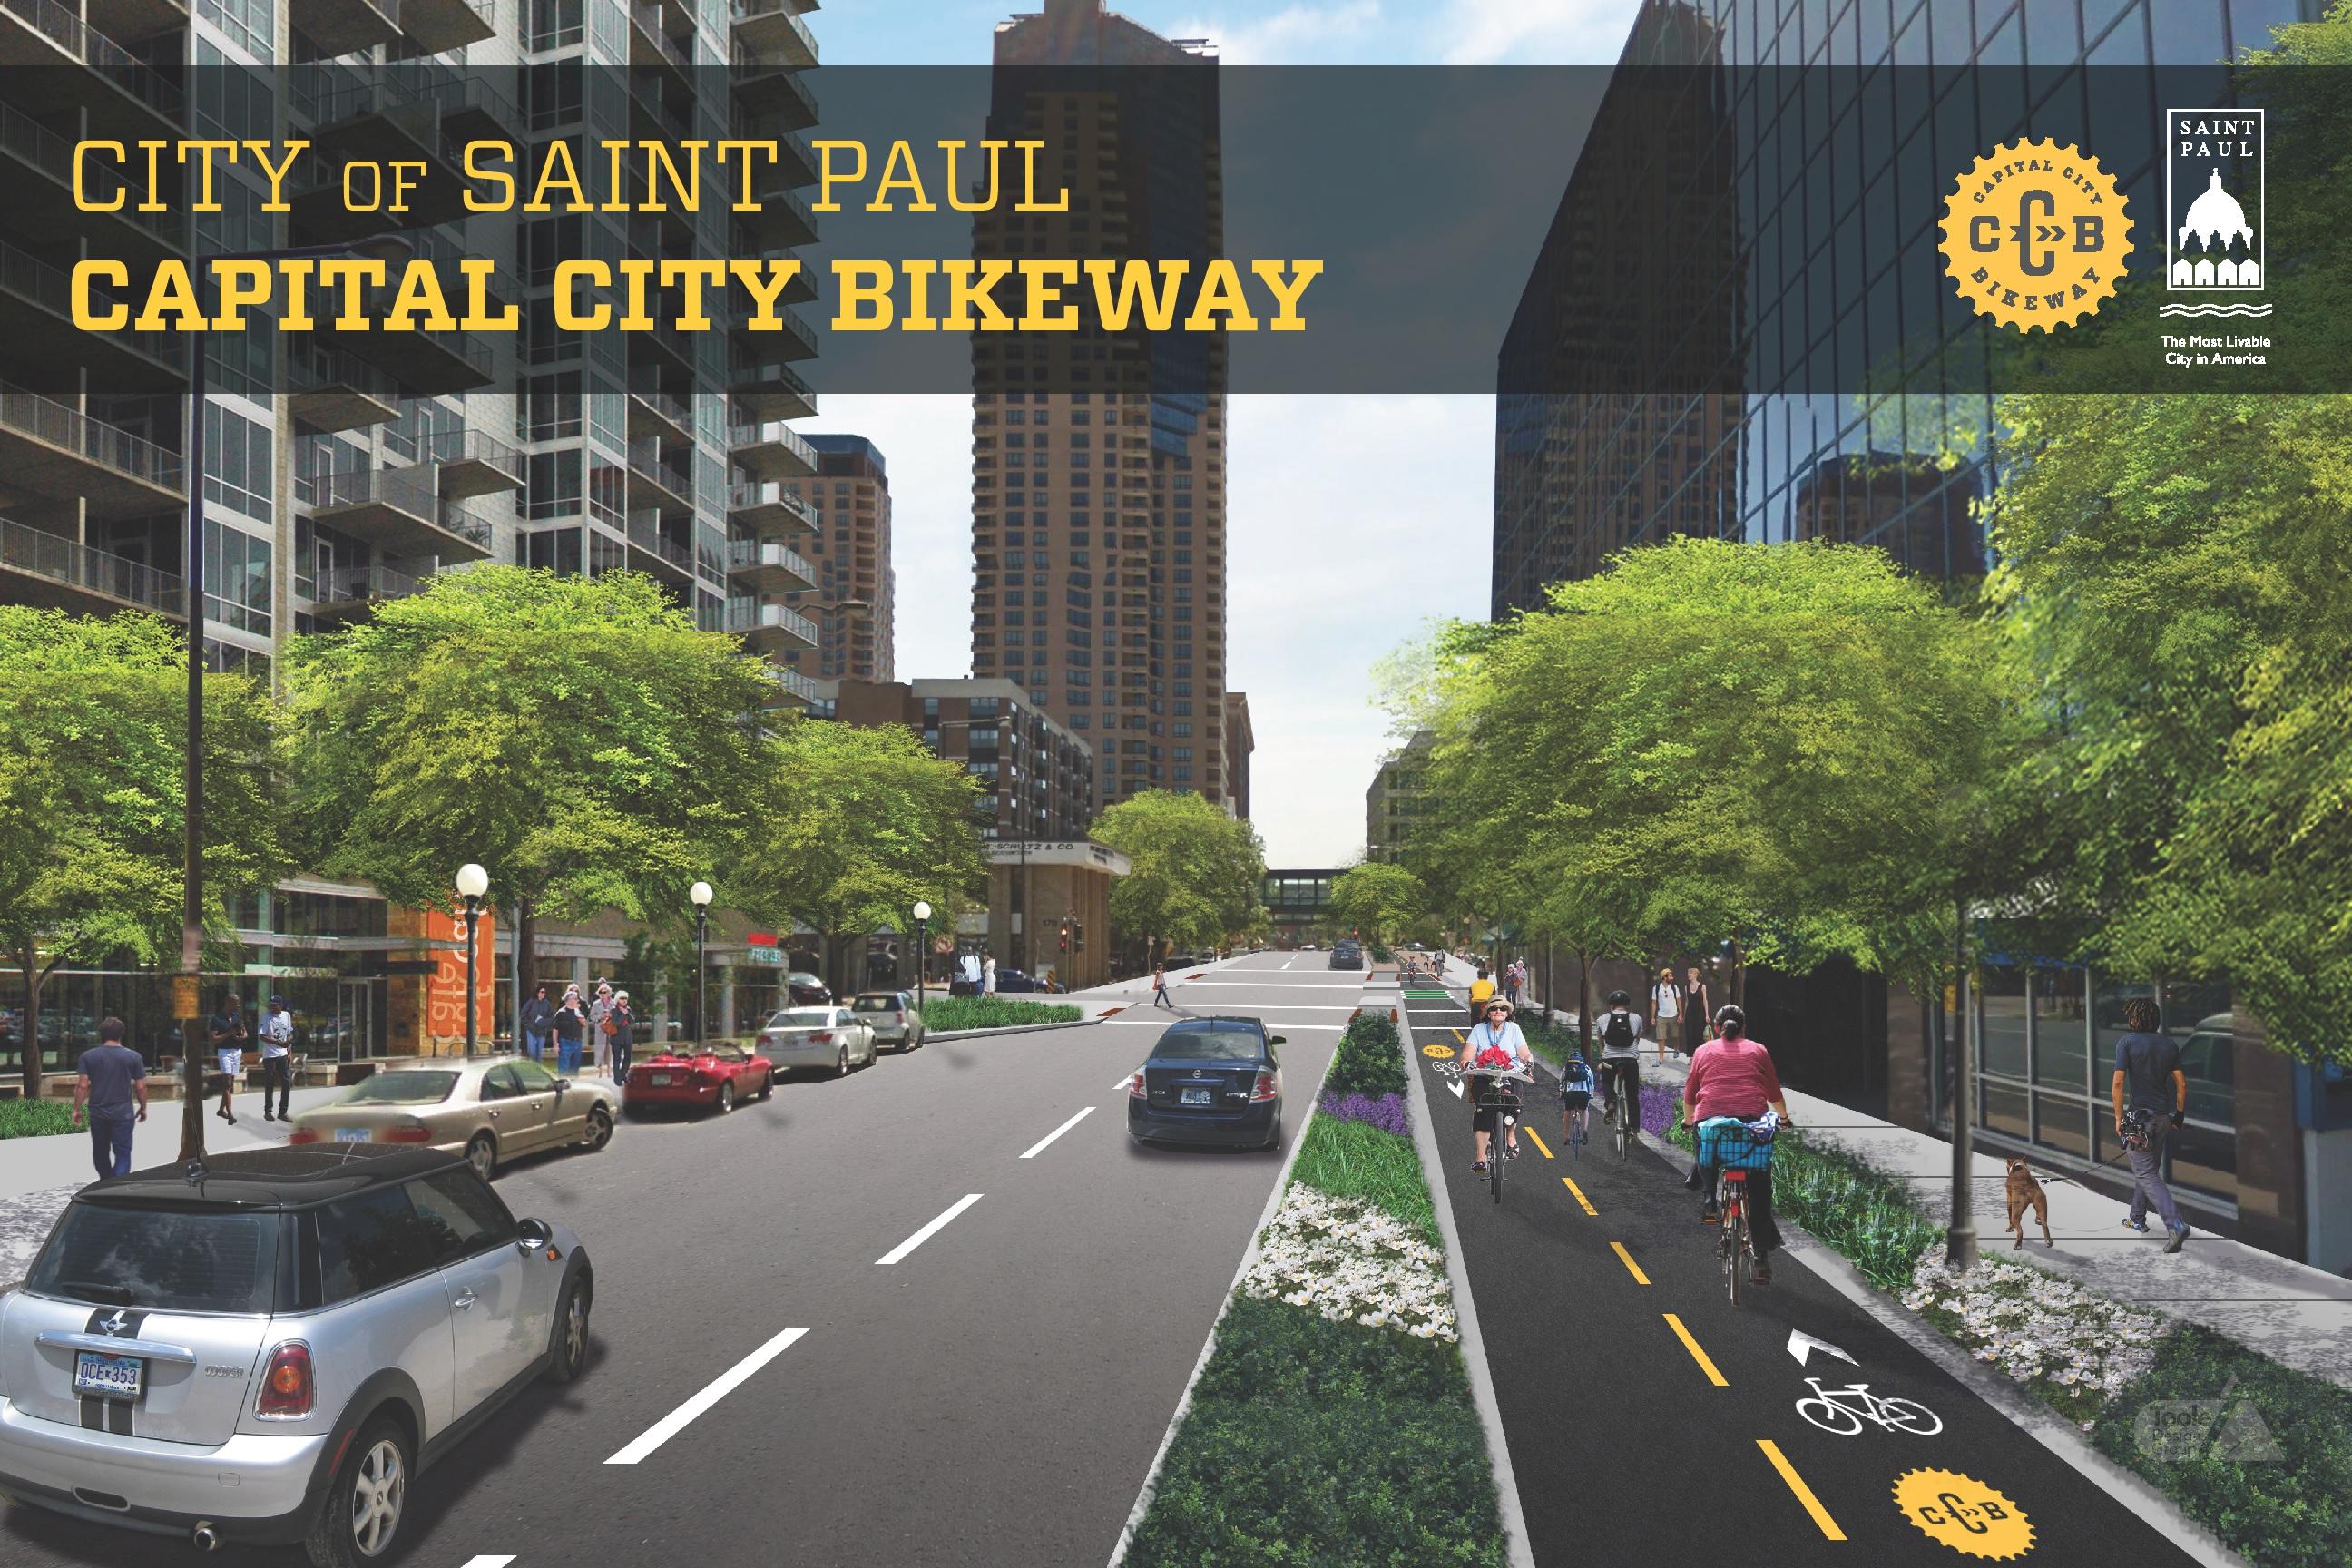 Capital City Bikeway Rendering